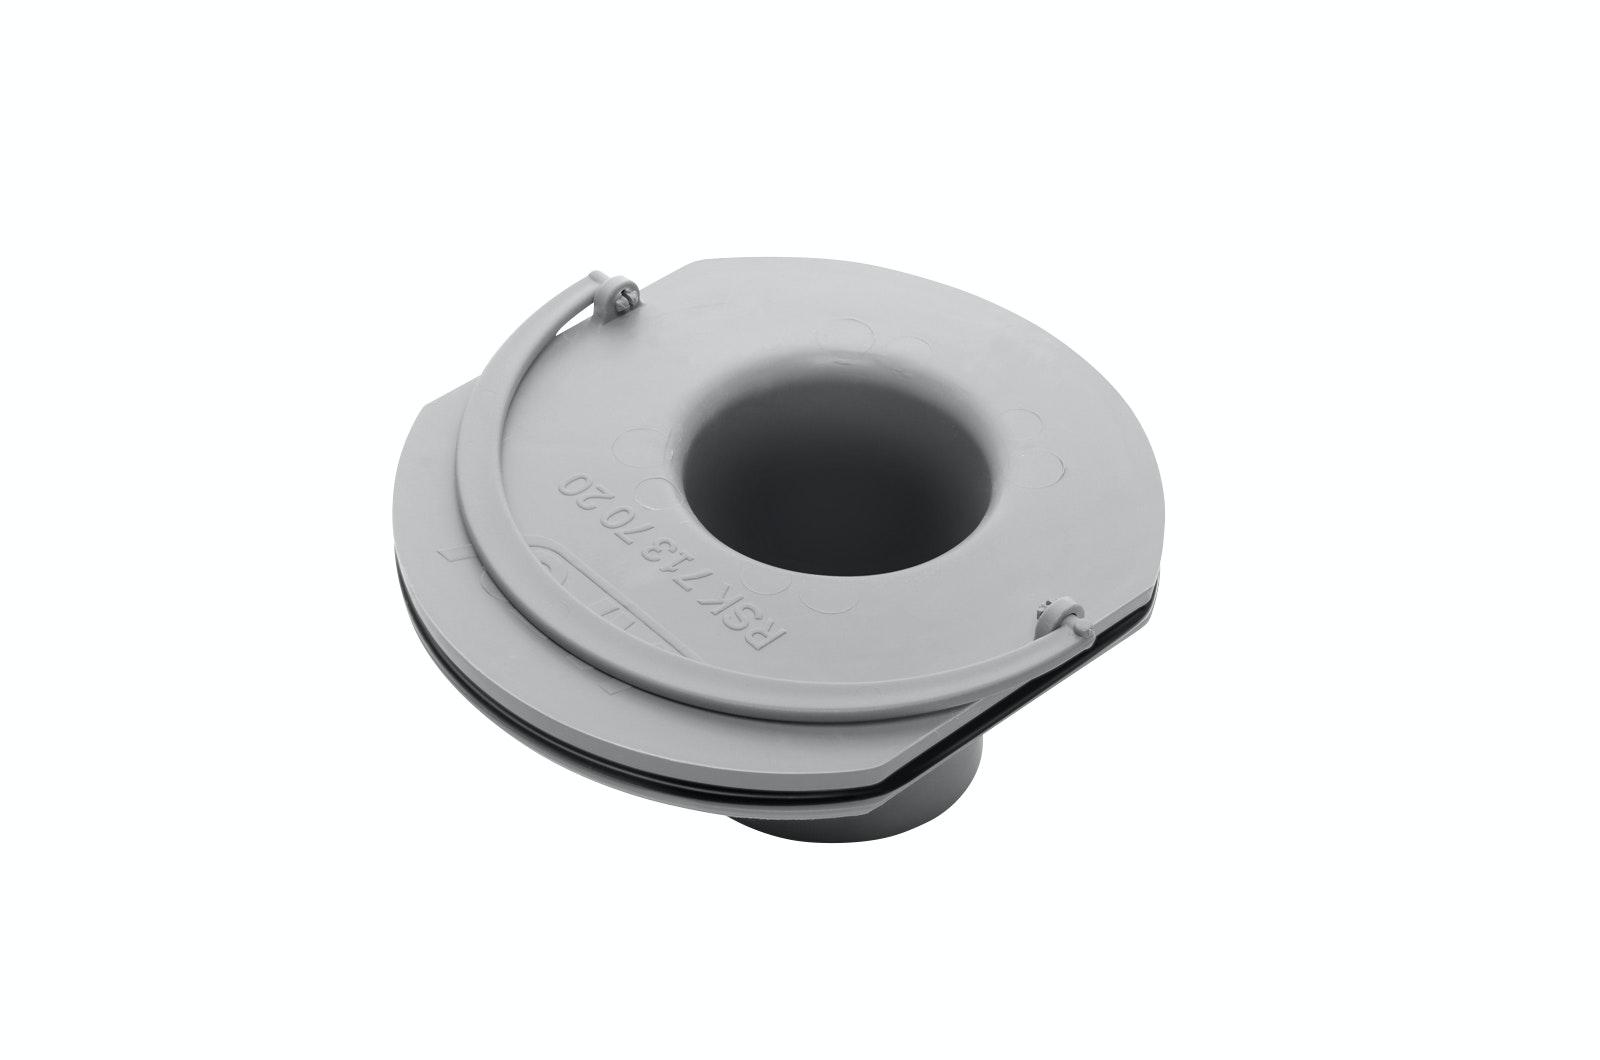 Vattenlåsinsats Jafo Unidrain För Psx-Pbx-Mikro